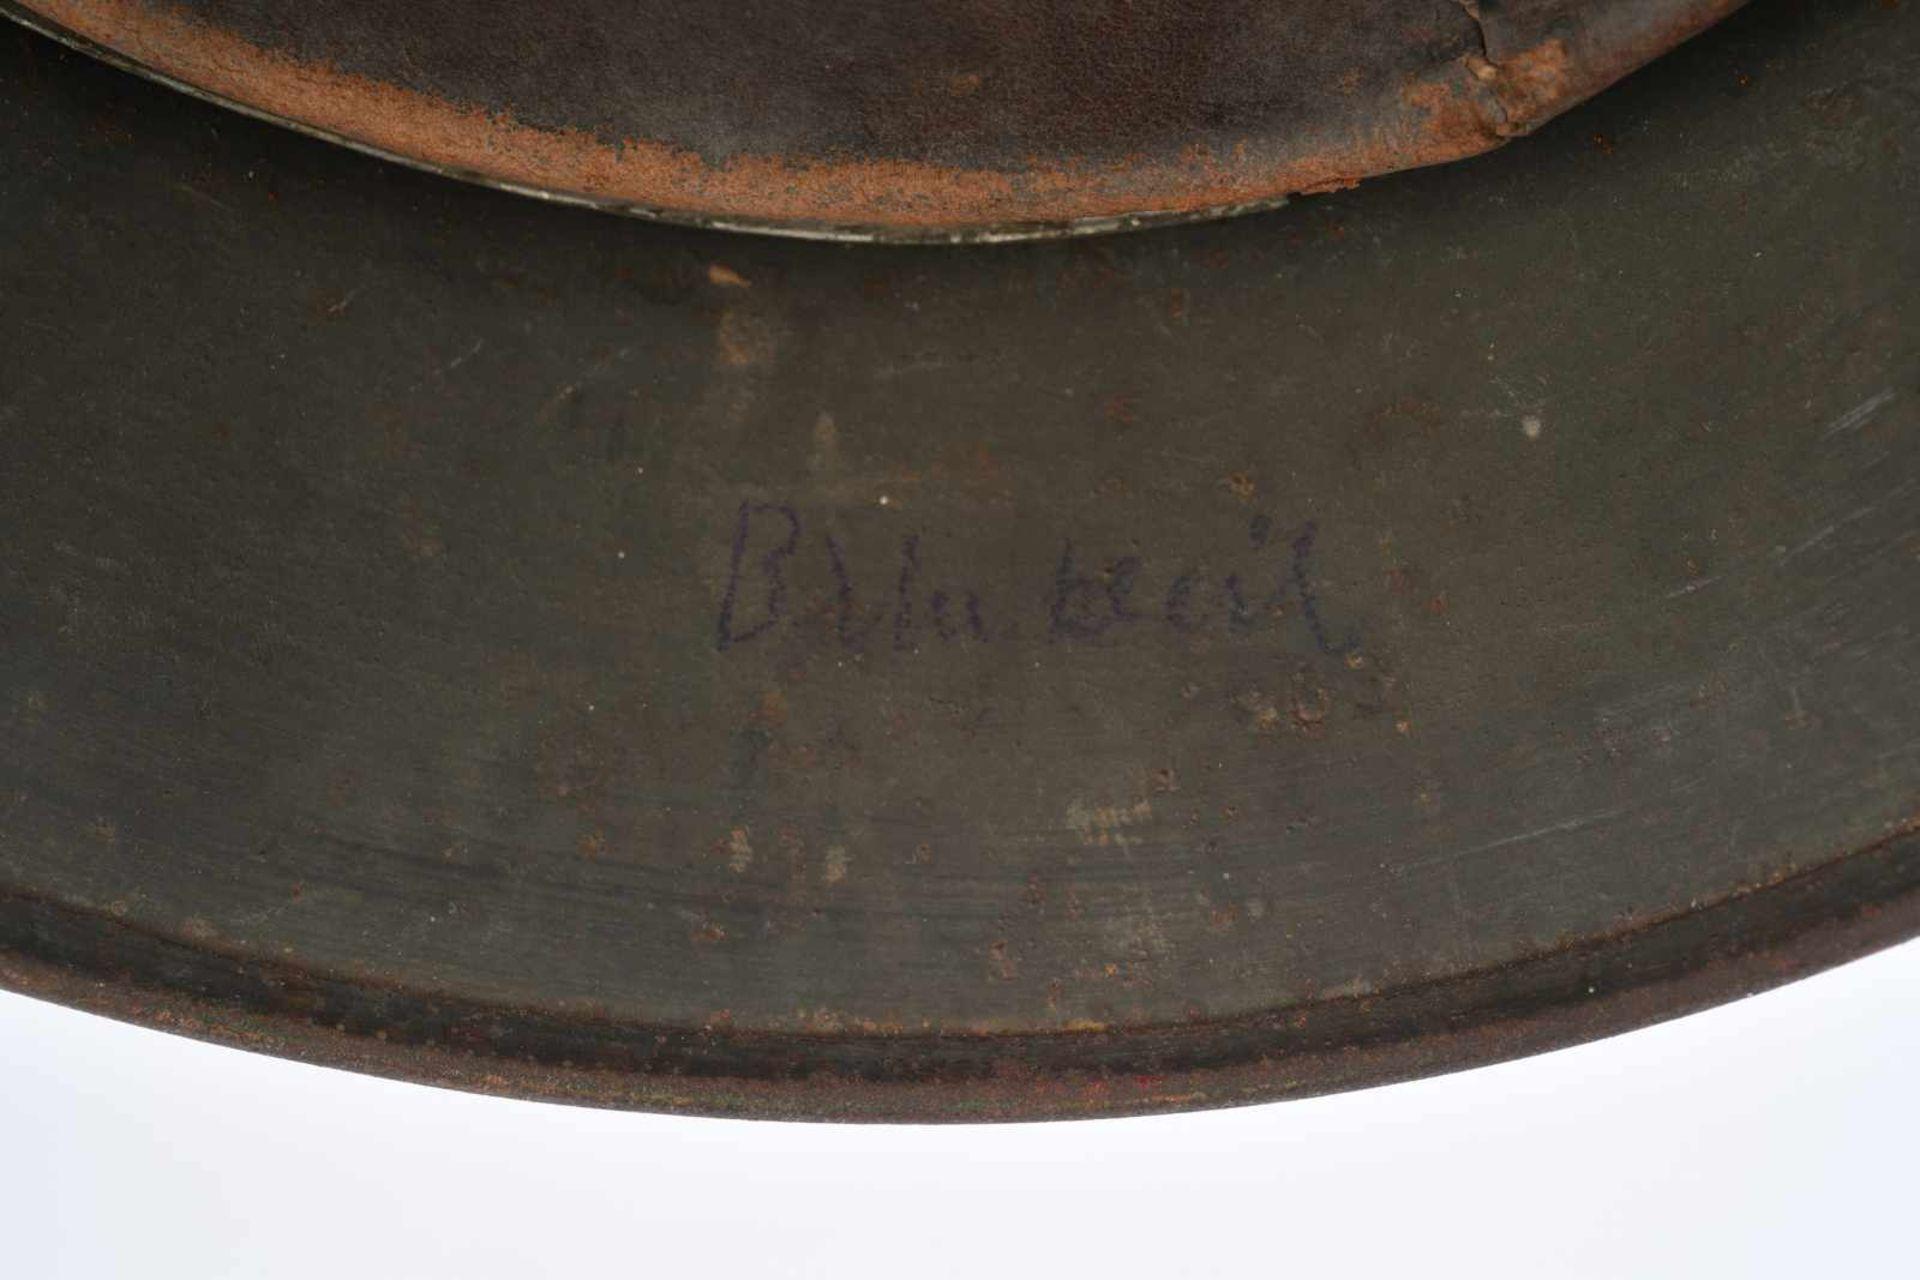 Casque nominatif de la Heer. Coque de casque 40, fabrication «Q62», numéro de lot illisible. - Bild 4 aus 4